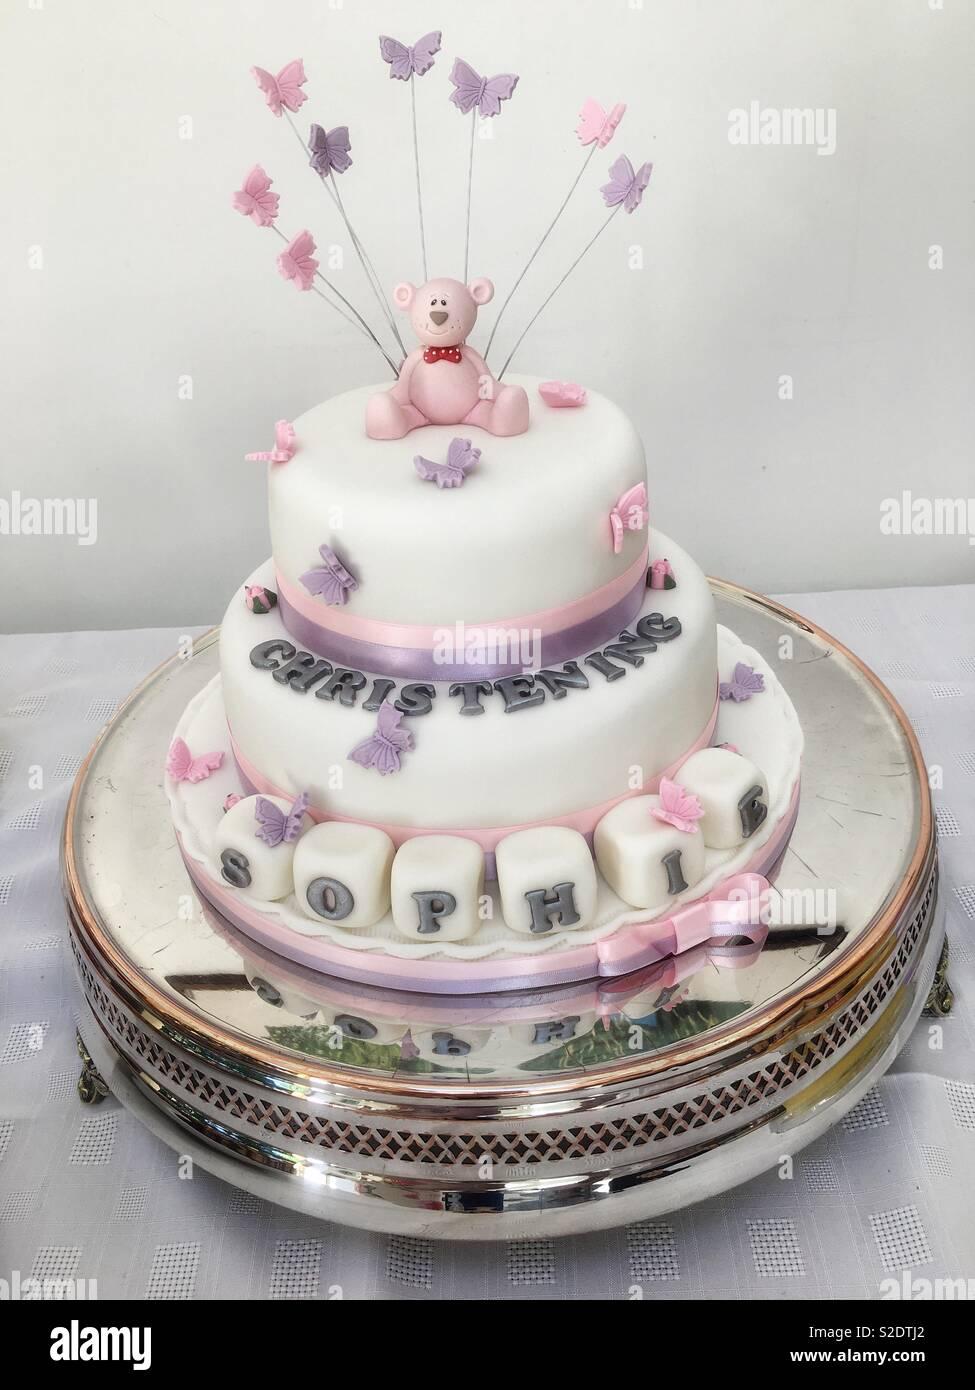 Girls christening cake - Stock Image